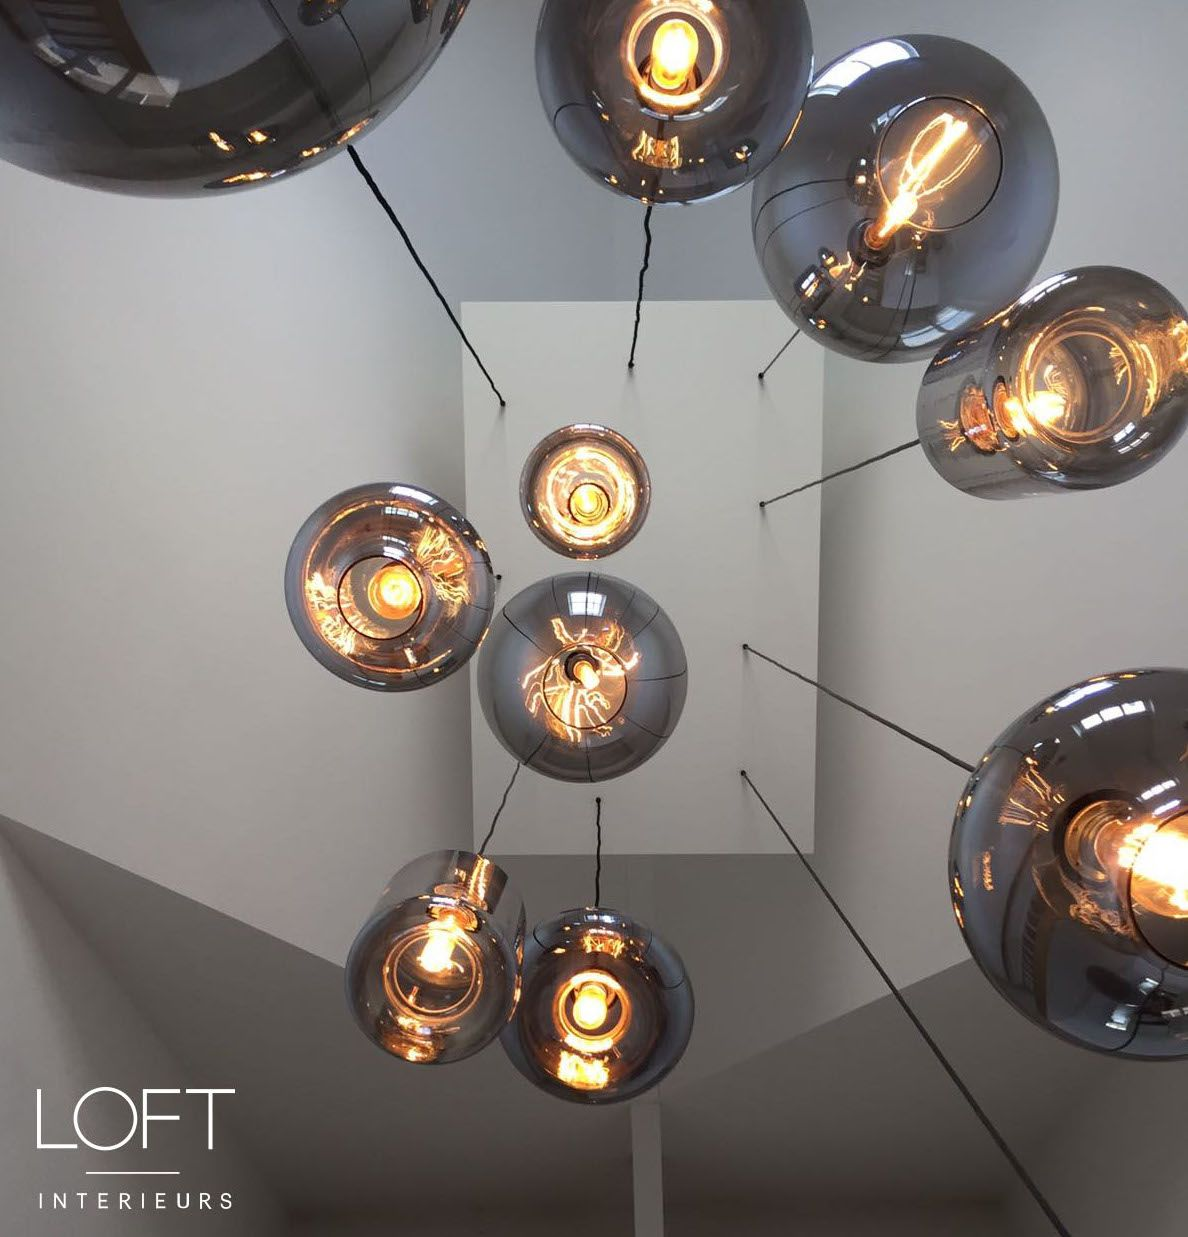 Loftinterieurs Bulbs Lighting Vide Hal Project Design